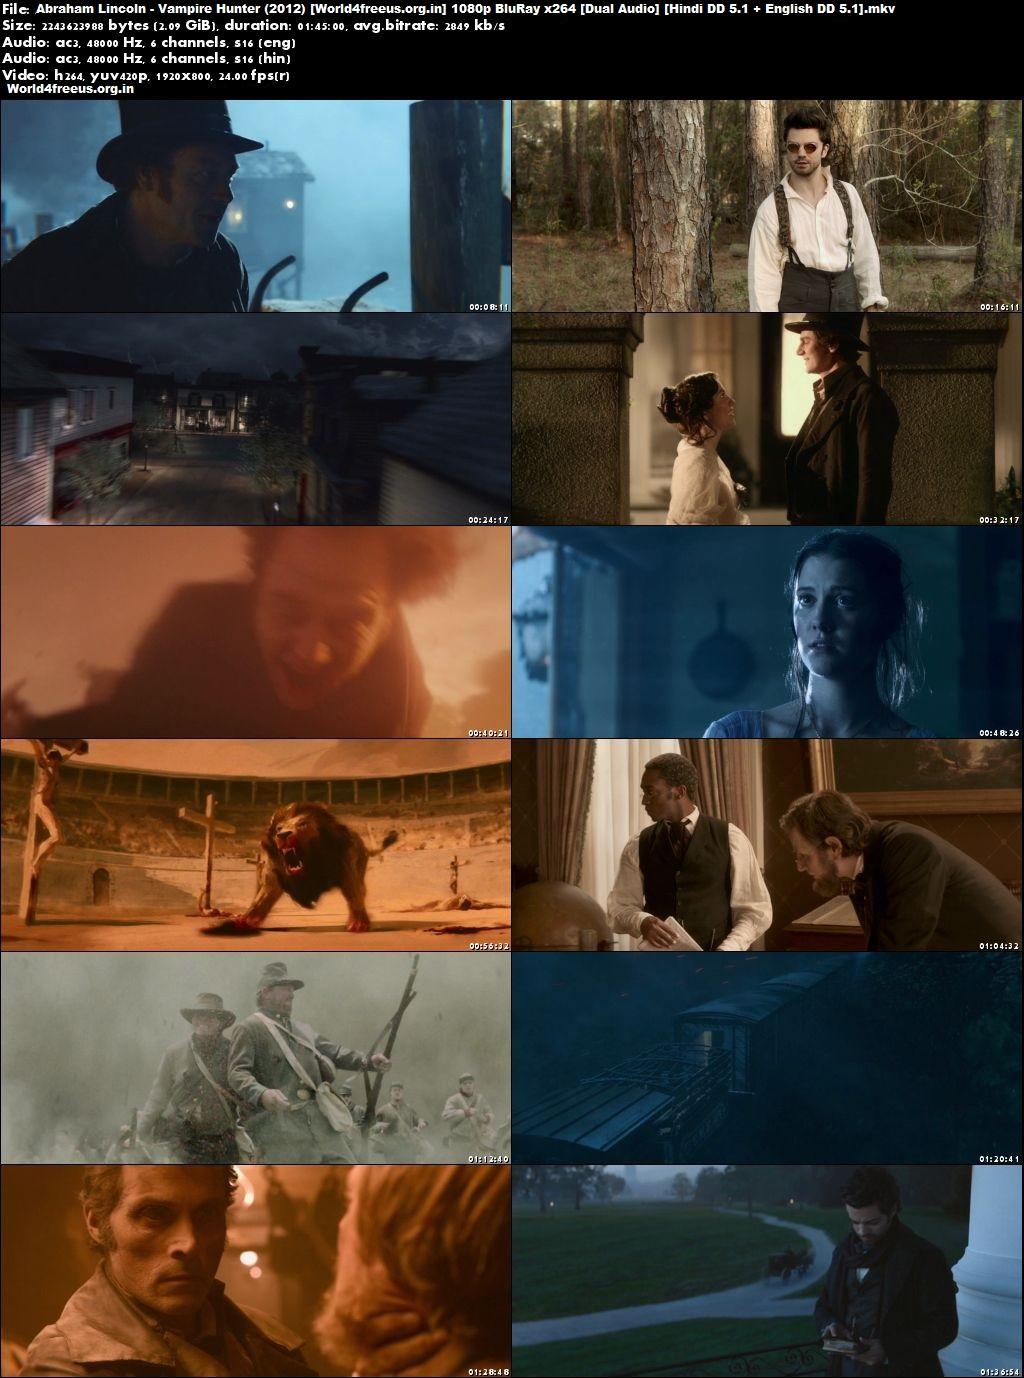 Abraham Lincoln: Vampire Hunter 2012 BRRip 1080p Dual Audio In Hindi English